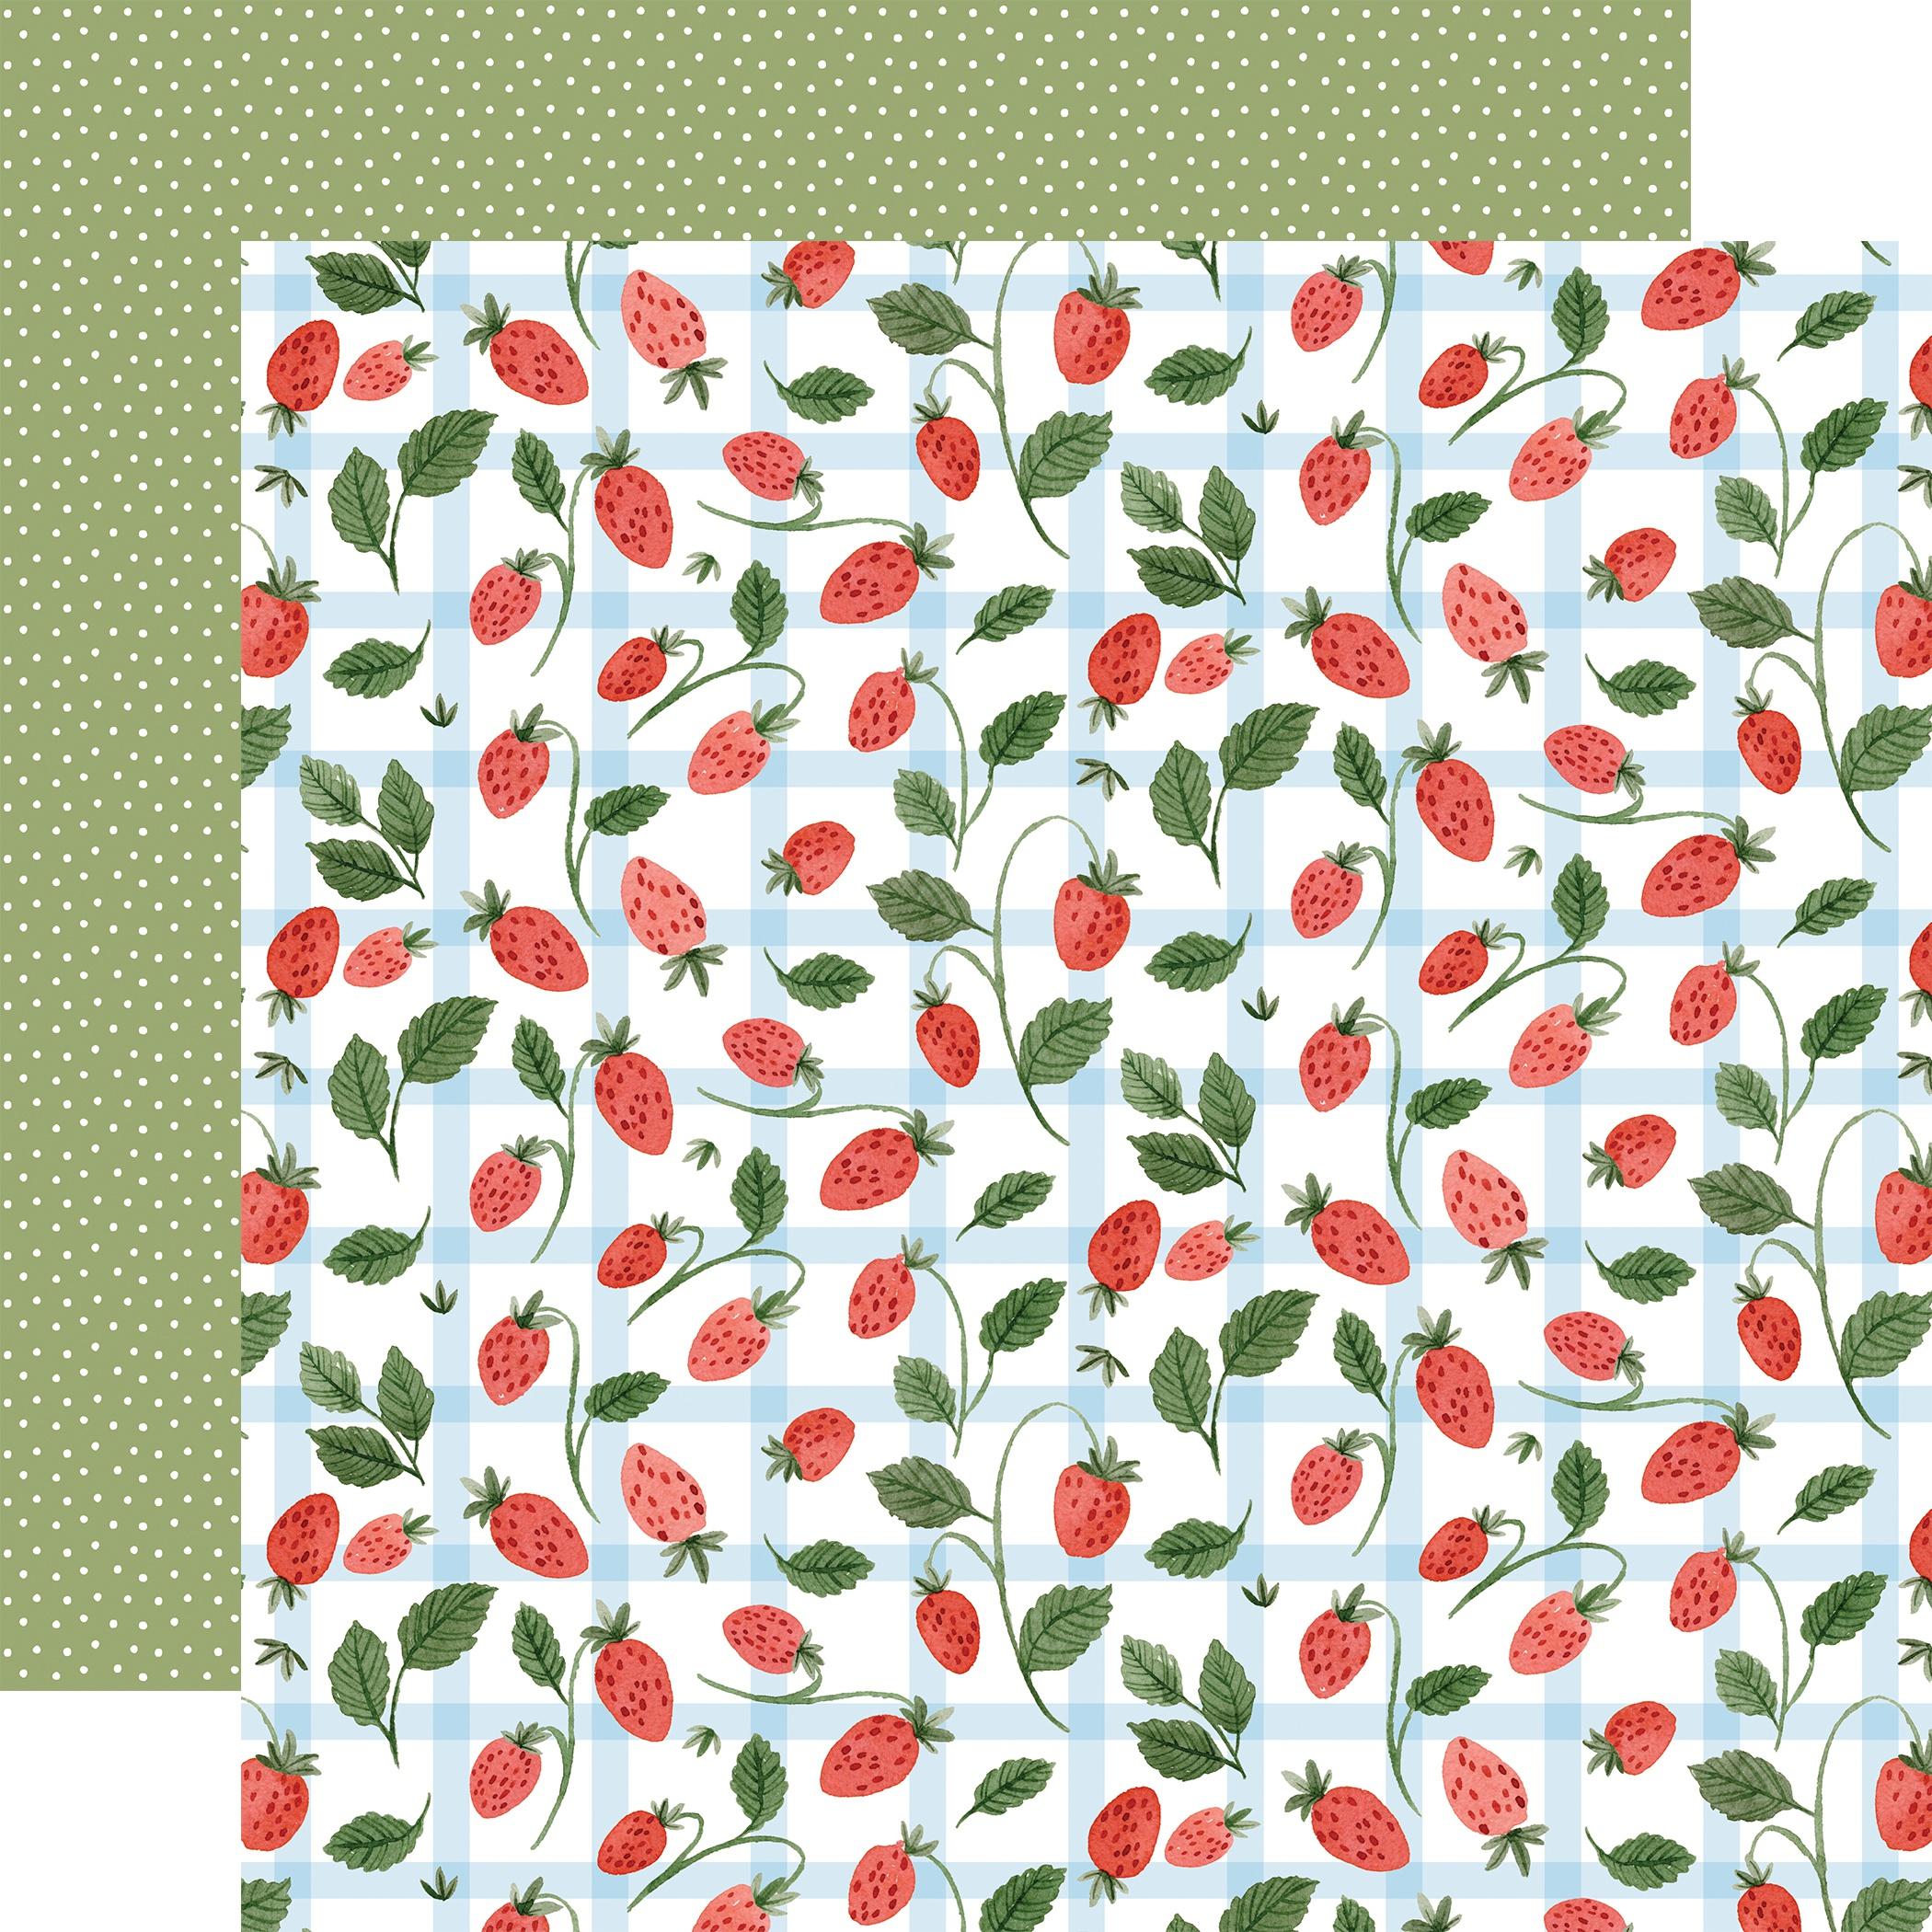 Carta Bella - Summer - SUMMER STRAWBERRIES - 12x12 Double-Sided Textured Cardstock